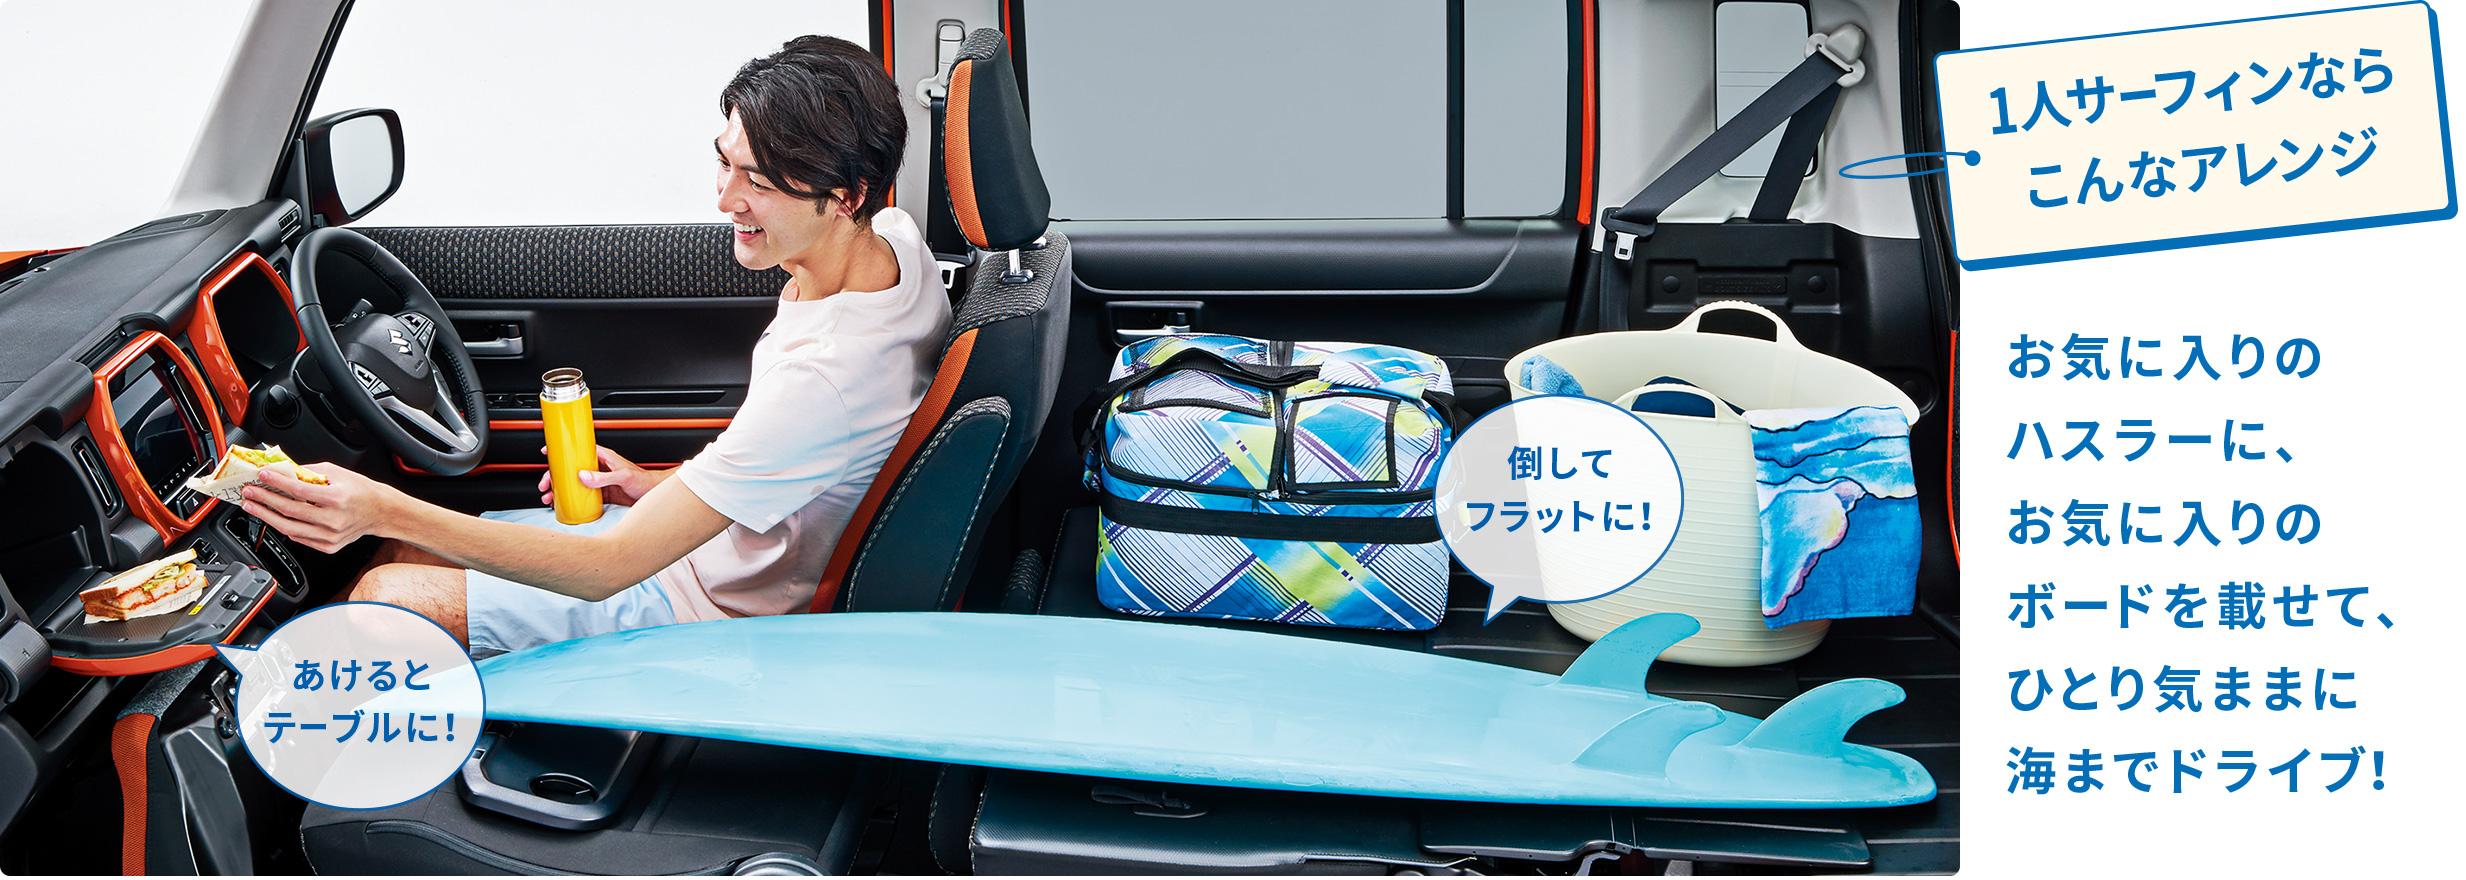 http://www.suzuki.co.jp/car/hustler/interior/img/img06.jpg